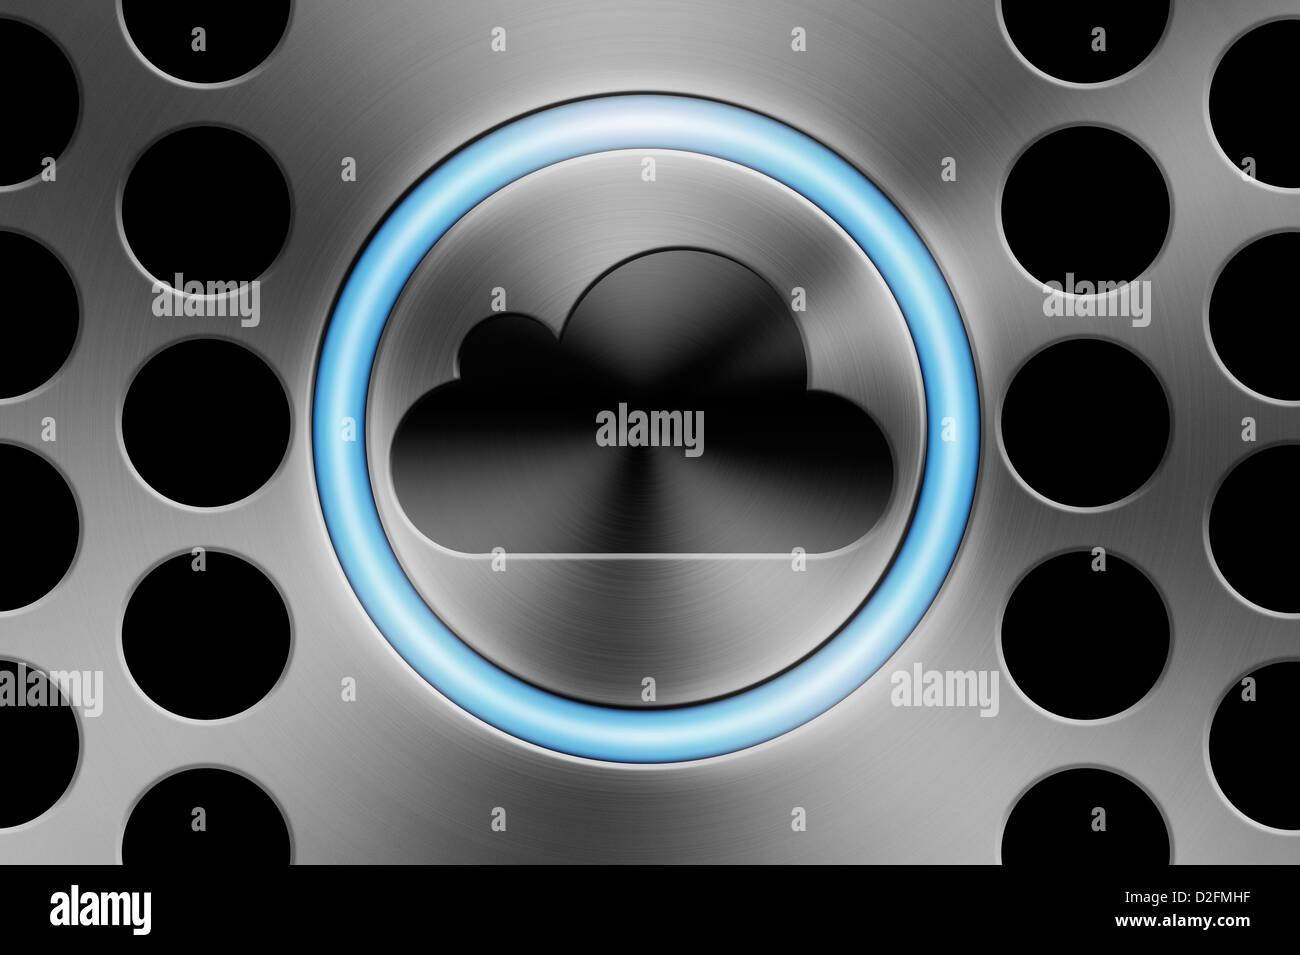 Cloud computing concept - Stock Image